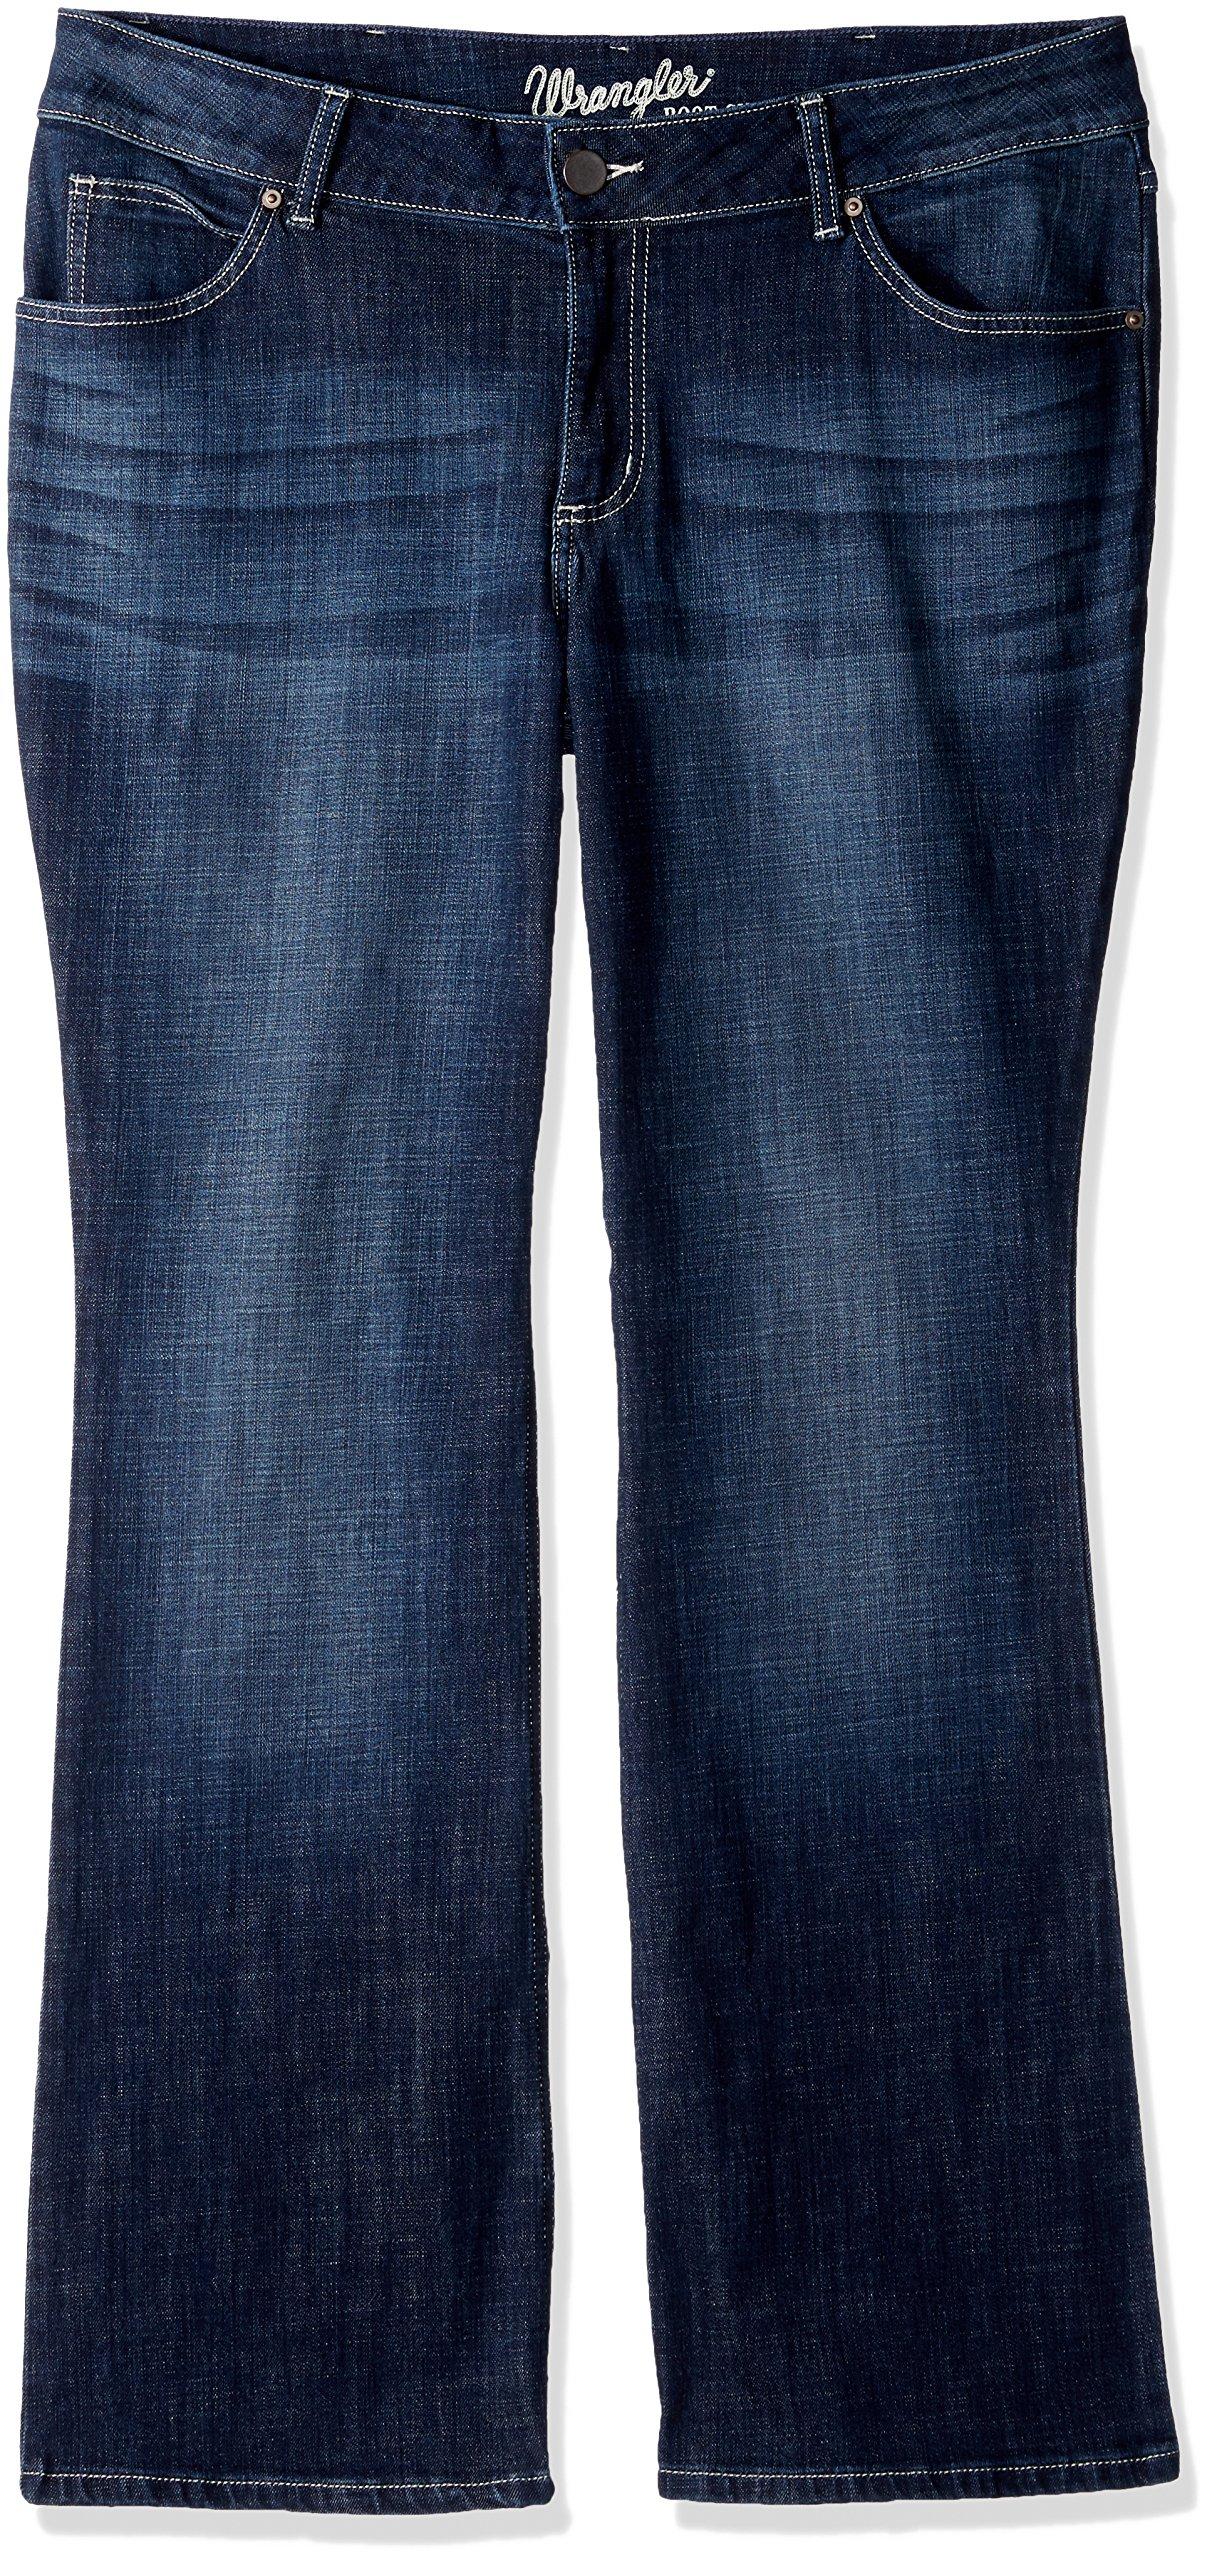 Wrangler Go-to Boot Cut Plus Jean